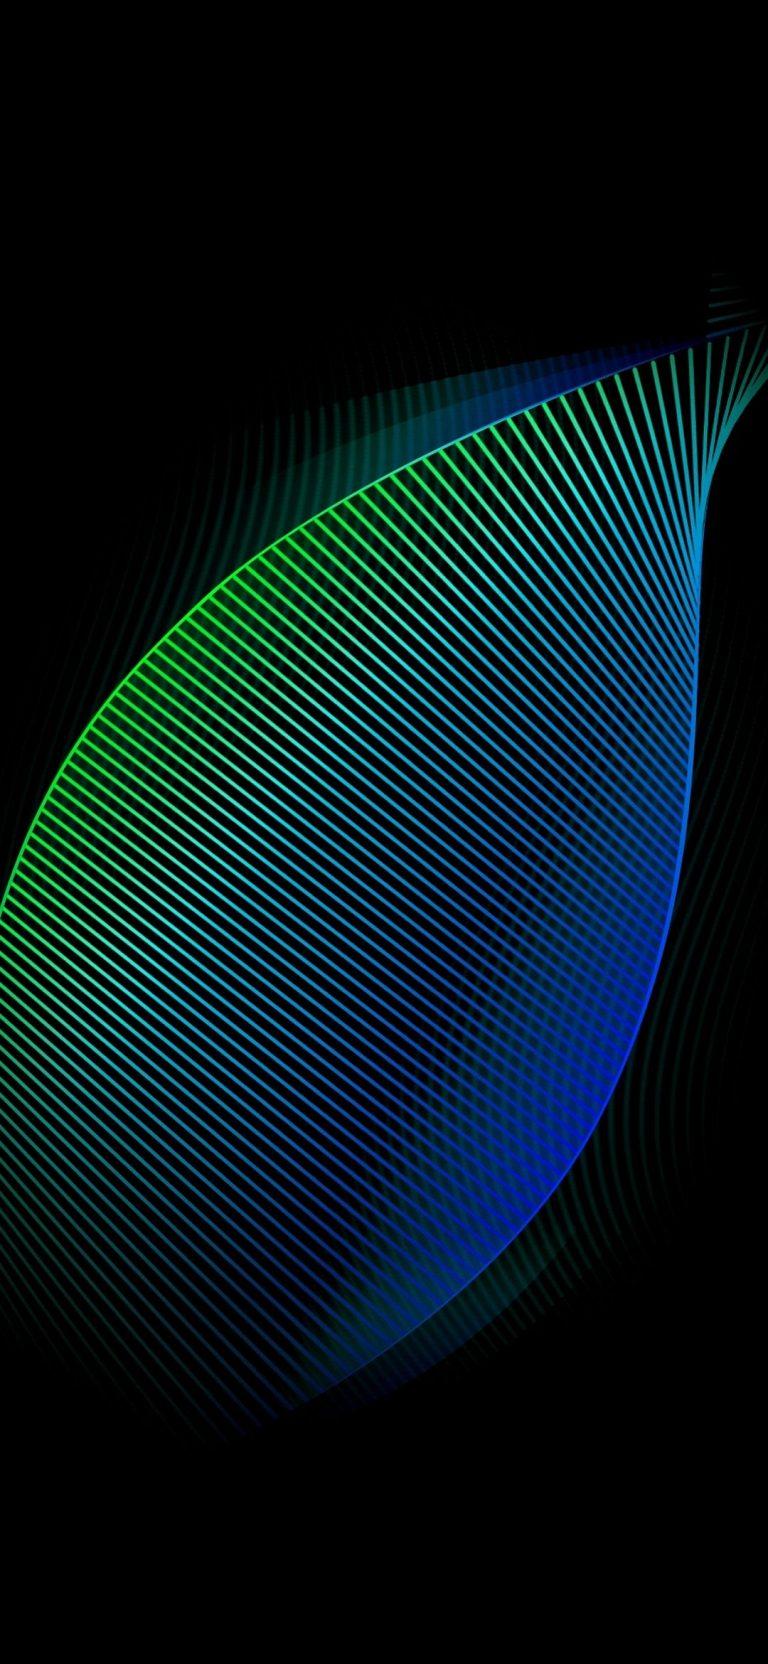 Amoled Phone Wallpaper 206 1080x2340 768x1664